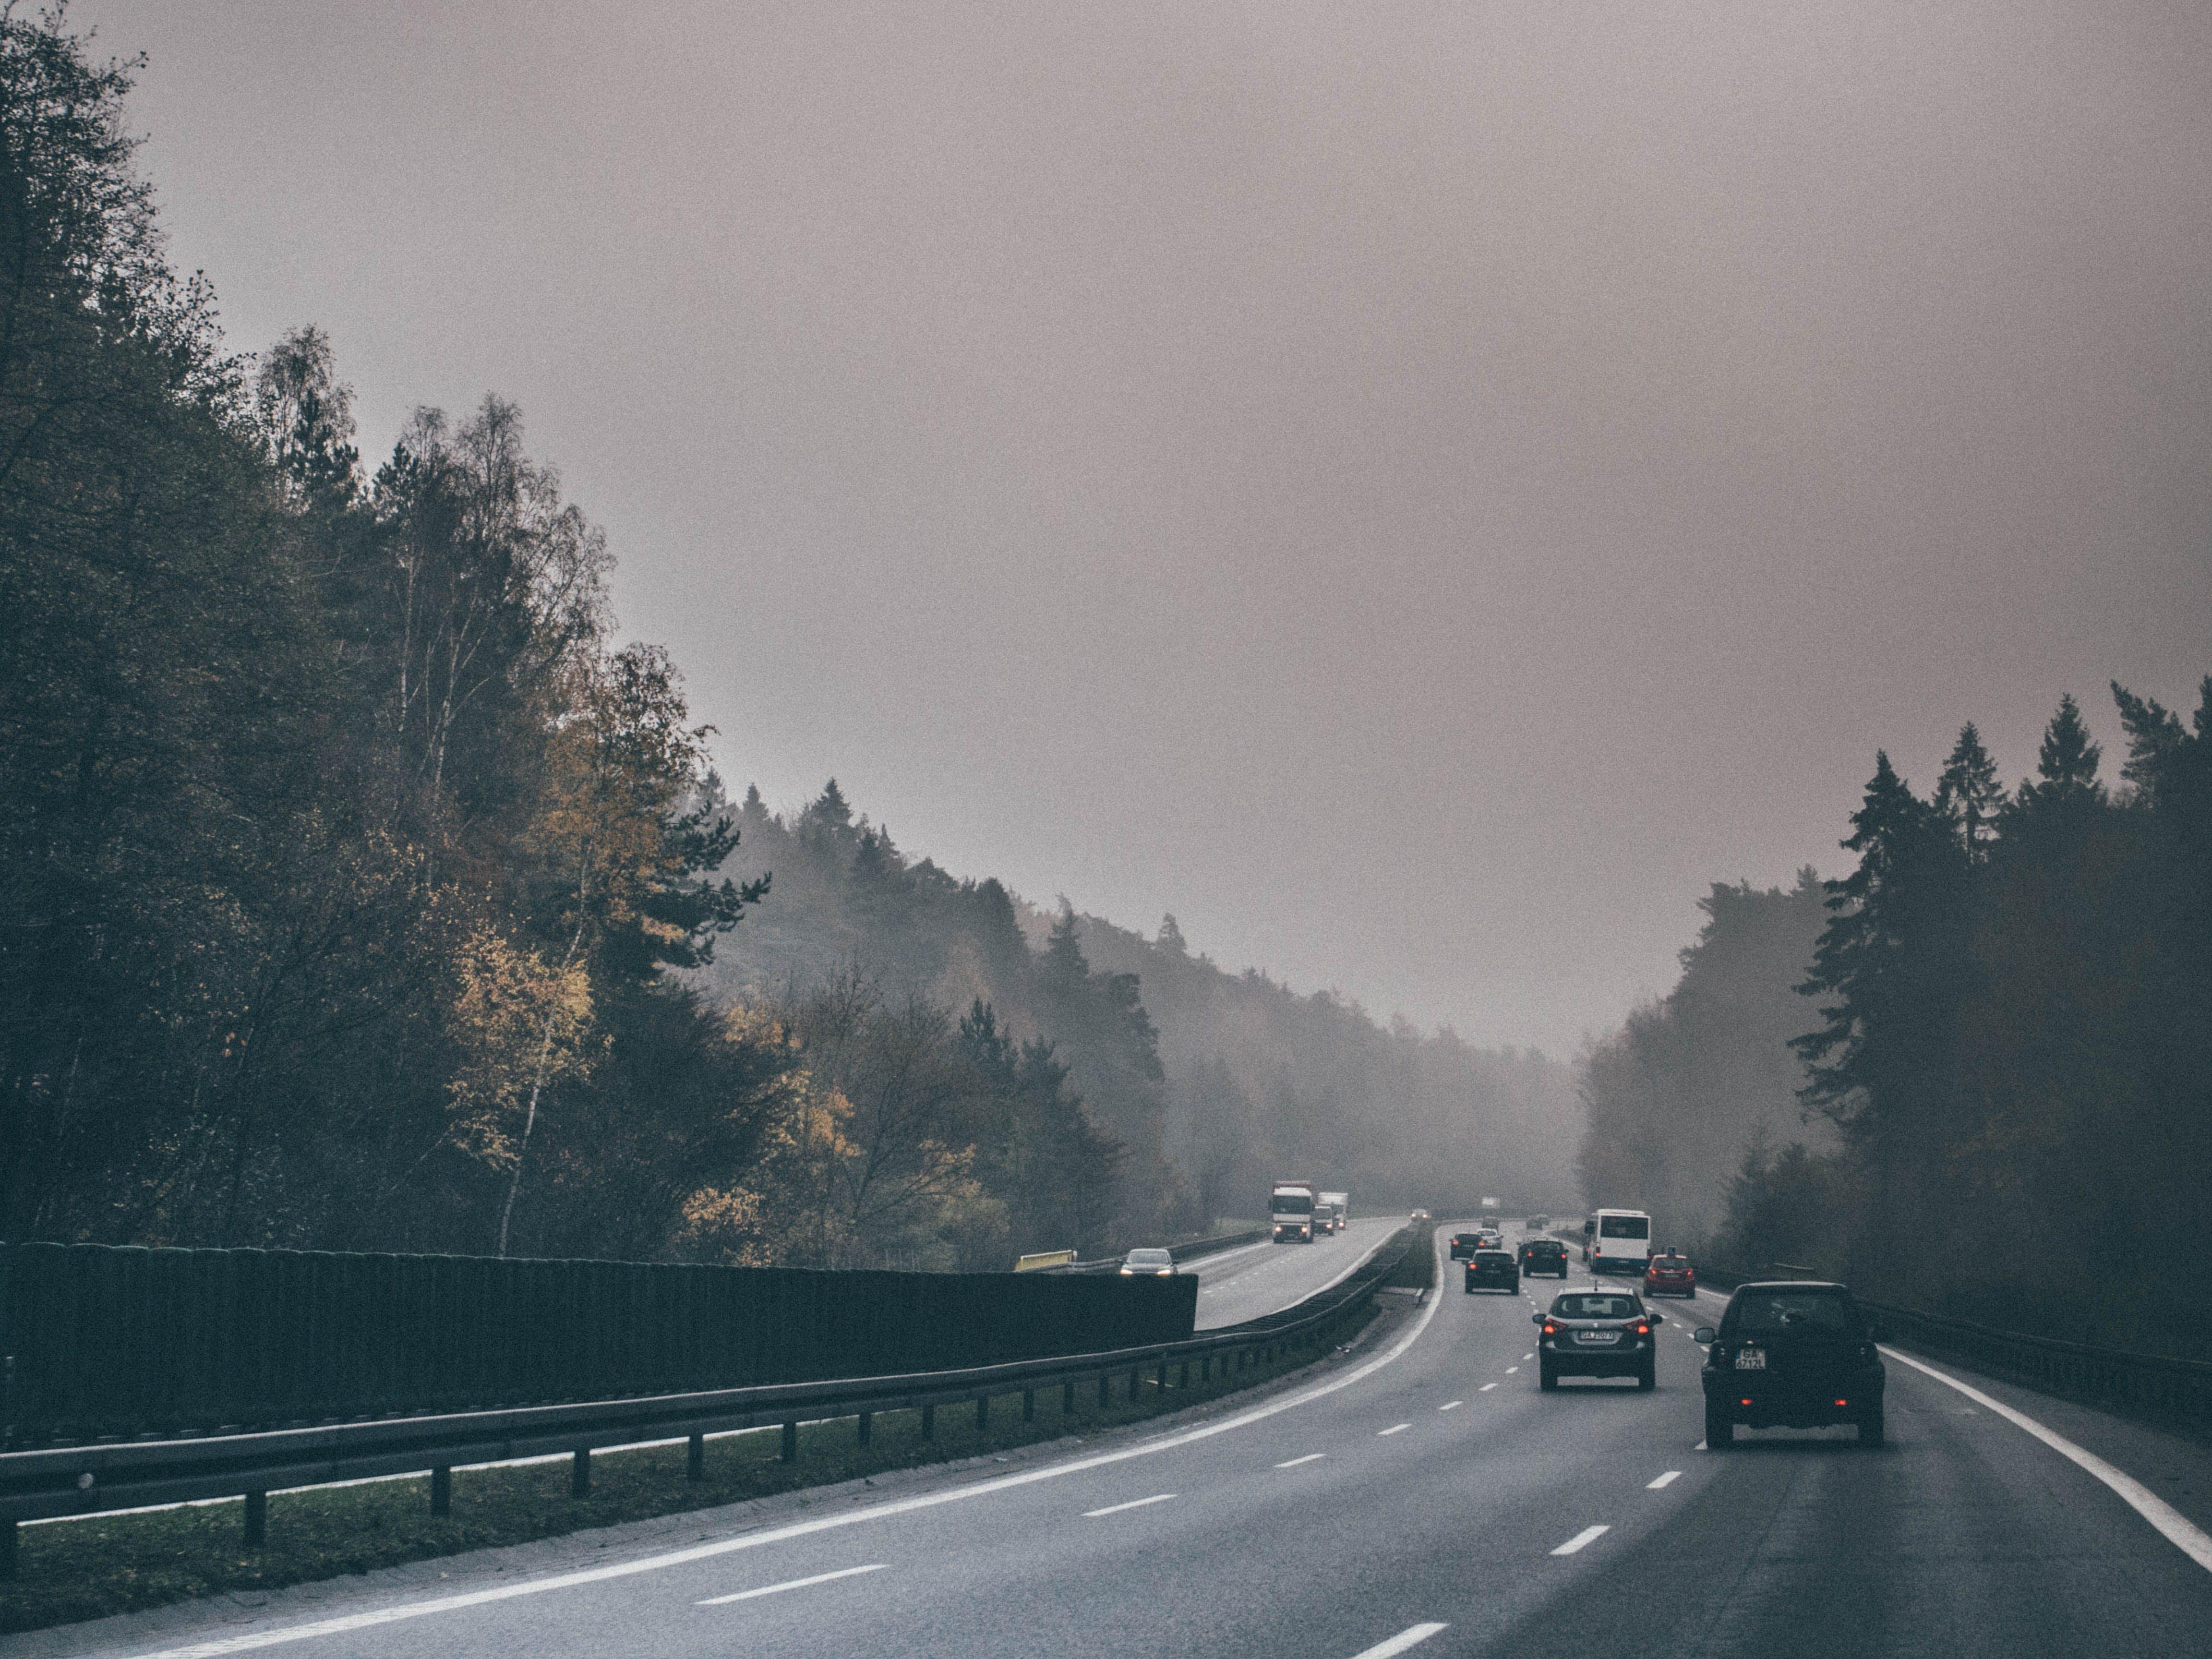 Vehicles on Gray Concrete Under Fog